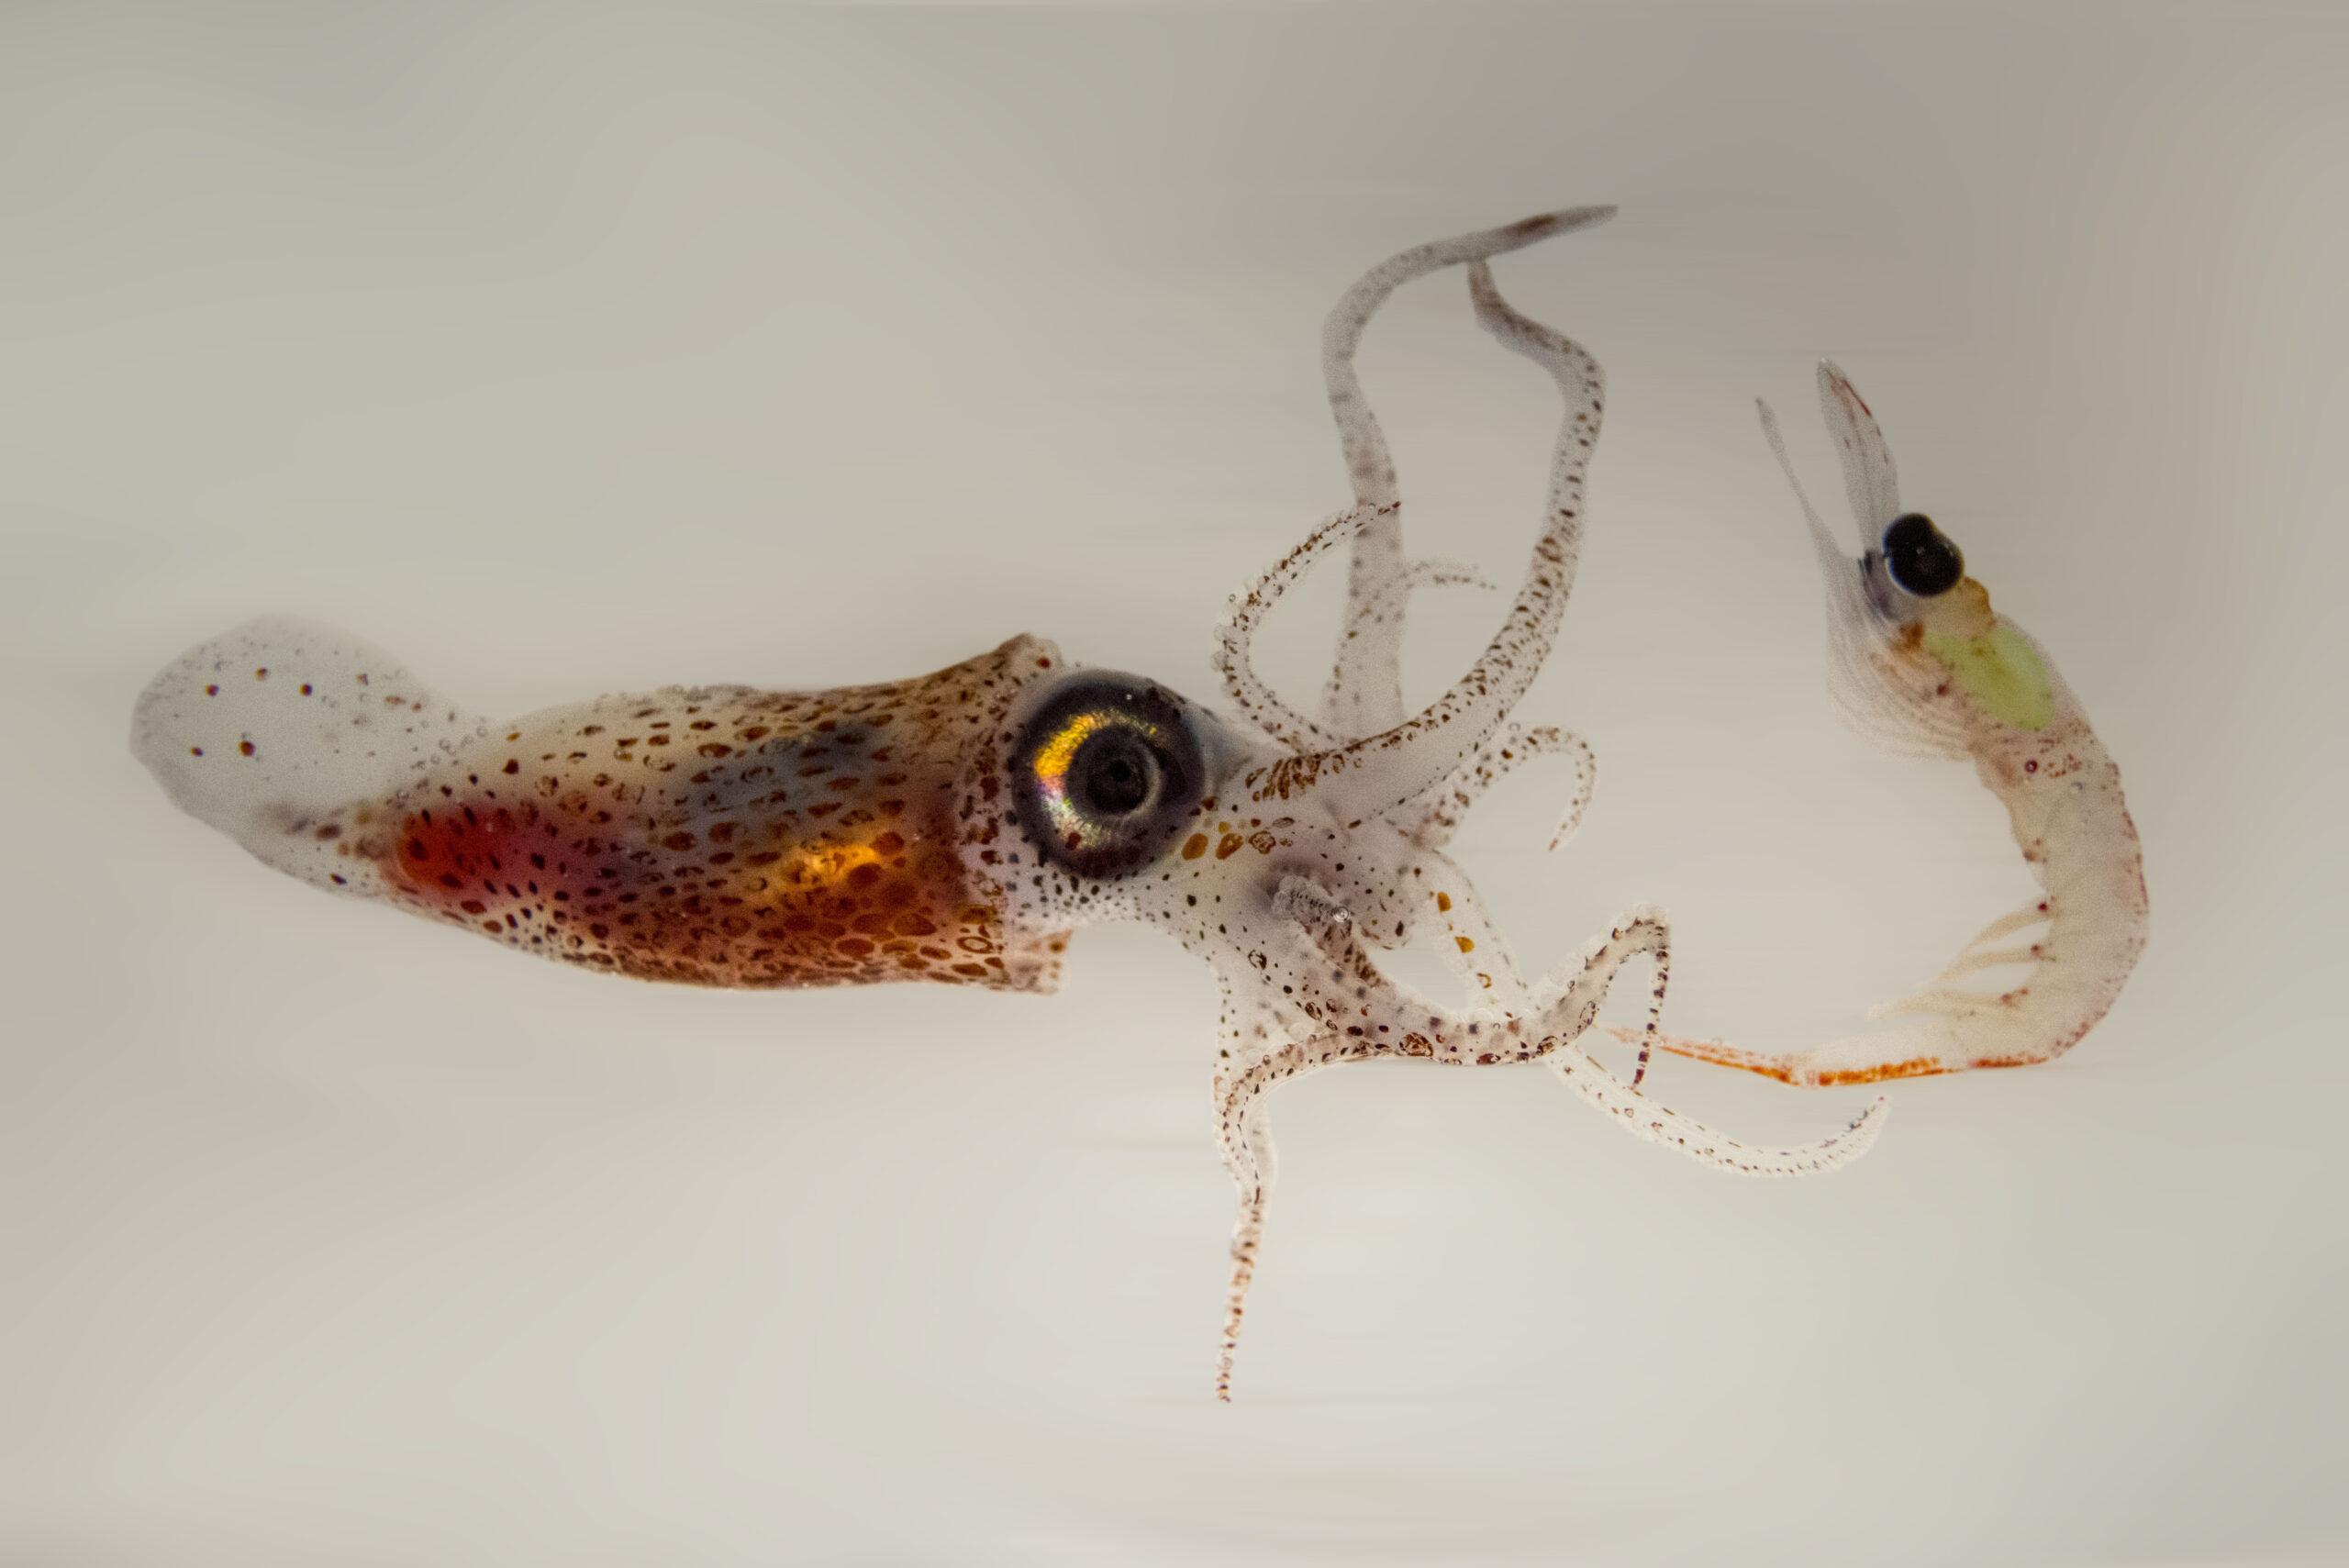 Zooplankton predator-prey, Antarctica